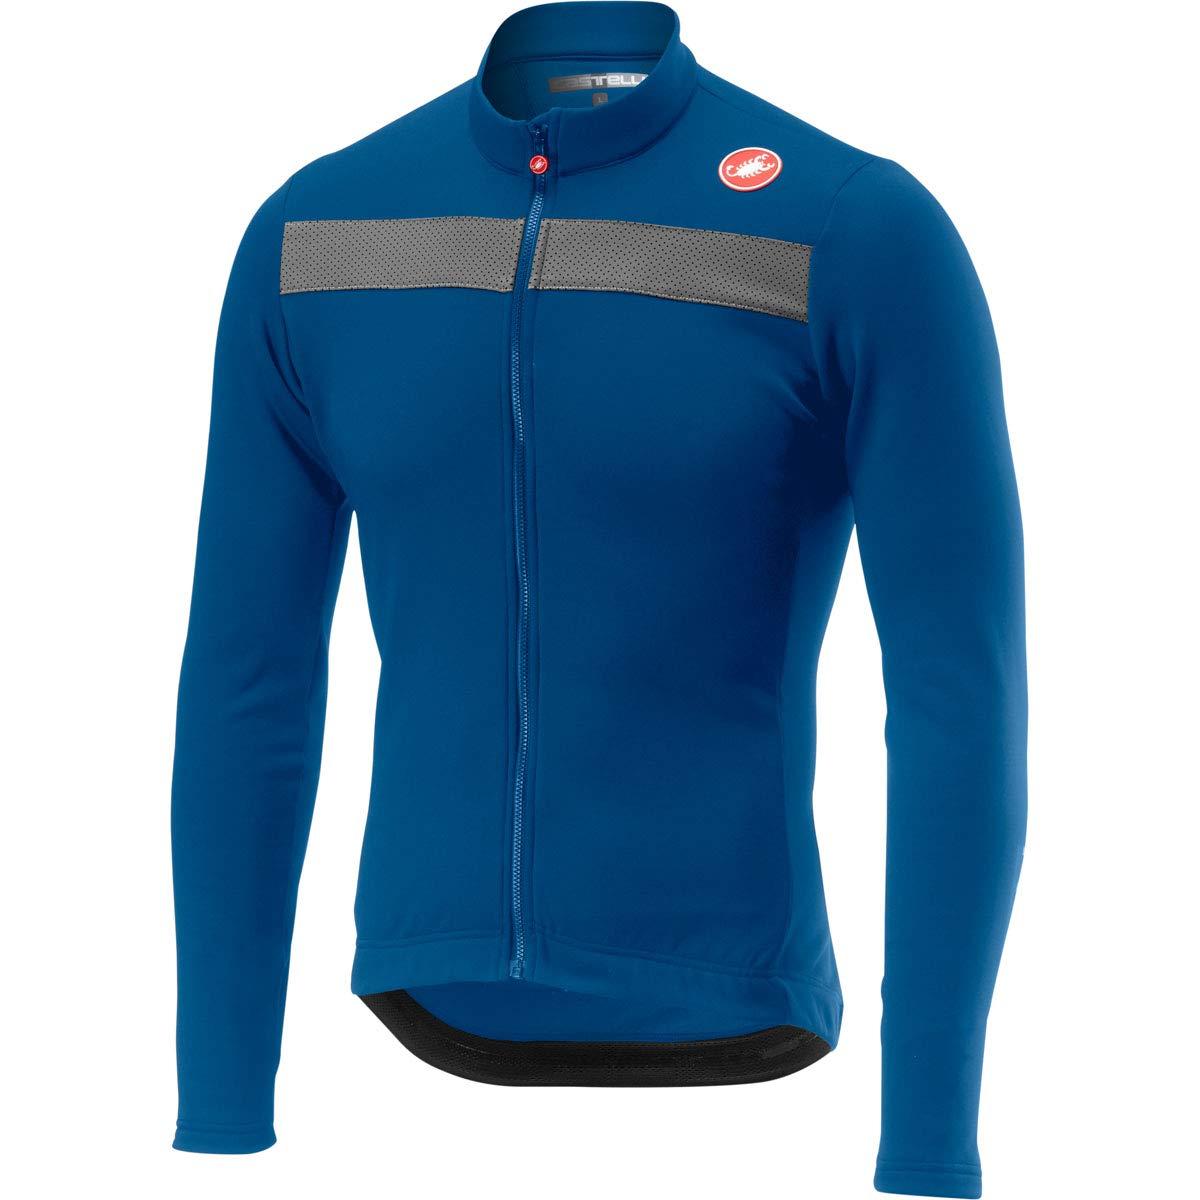 Castelli Mens Puro 3 Full Zip Bike Jersey